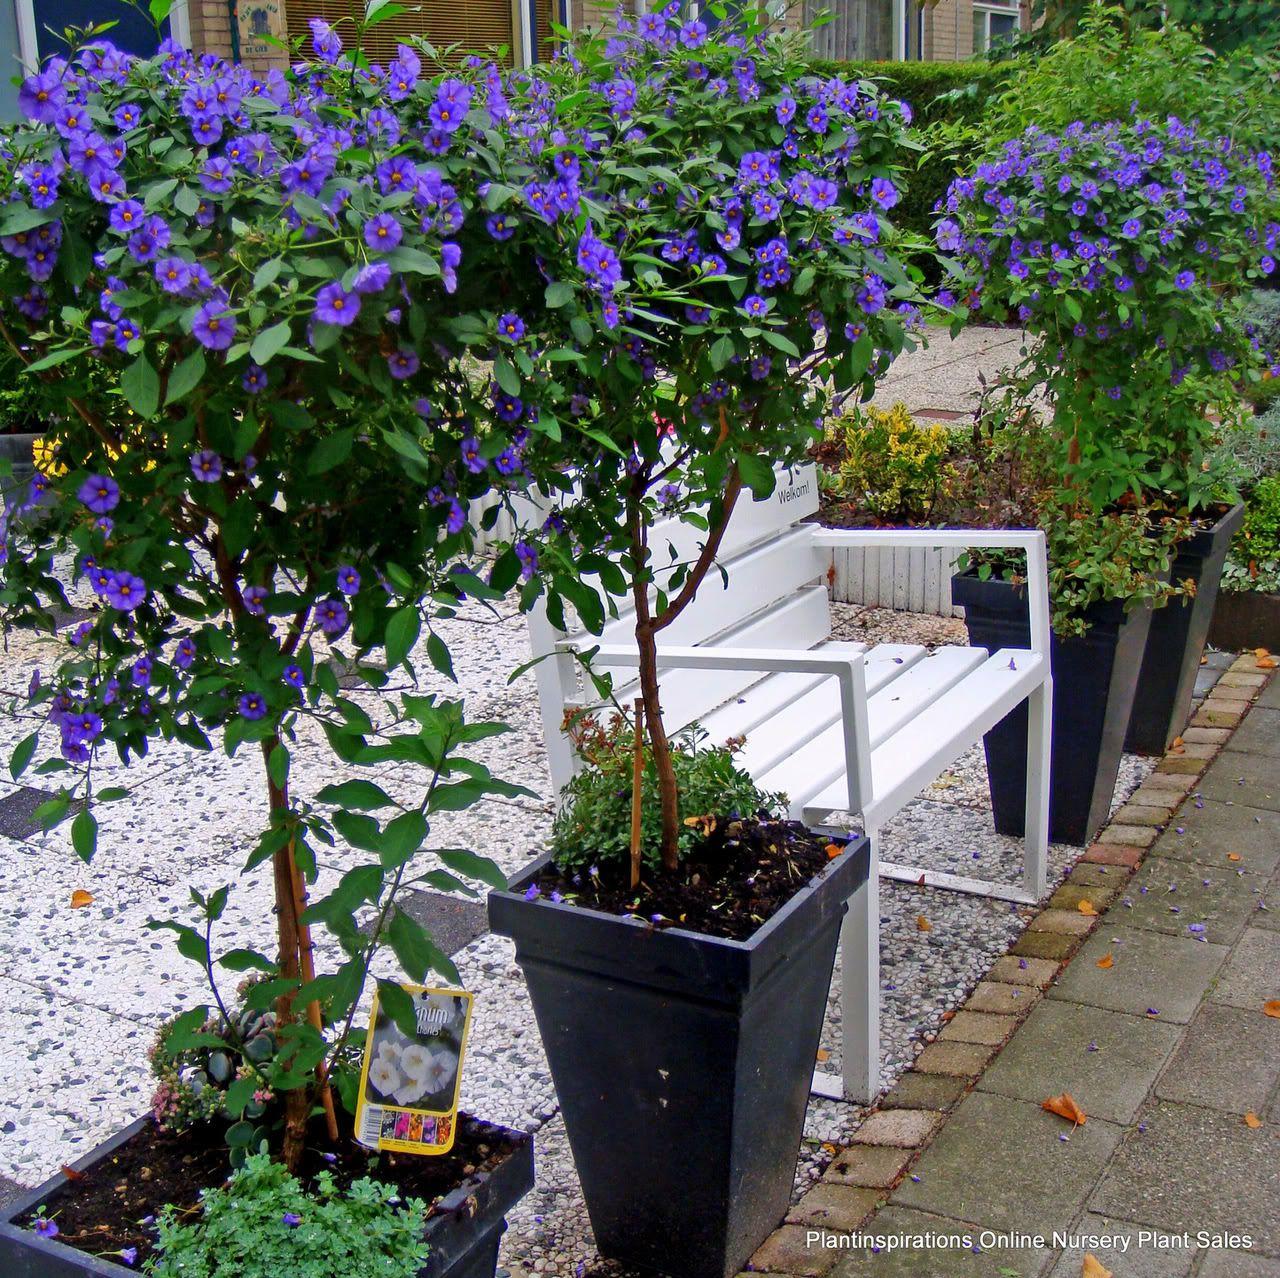 Plant Inspirations Nursery S Online Delivered Australia Wideblue Potato Bush Solanum Rantonetti X 8 Hardy Garden Plants Lycianthes Rantonnei